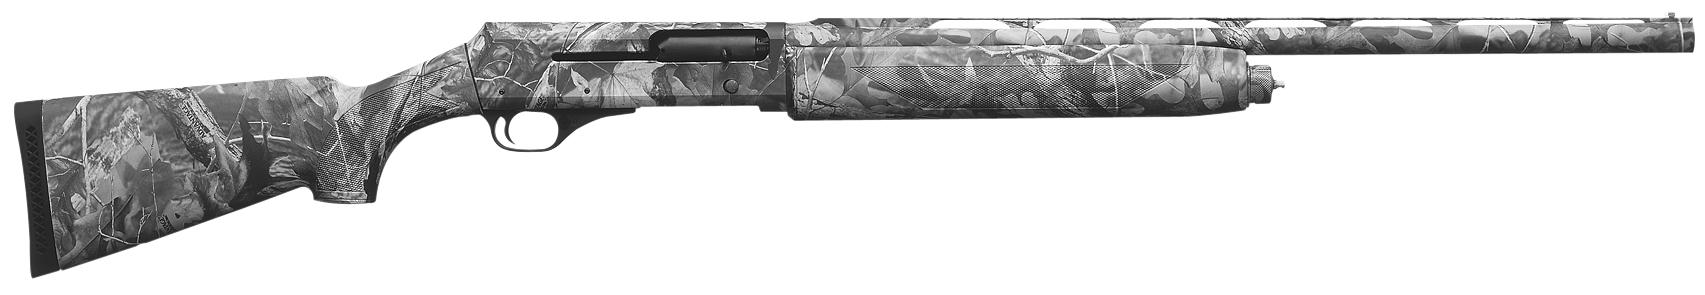 Variomax 912 Camo